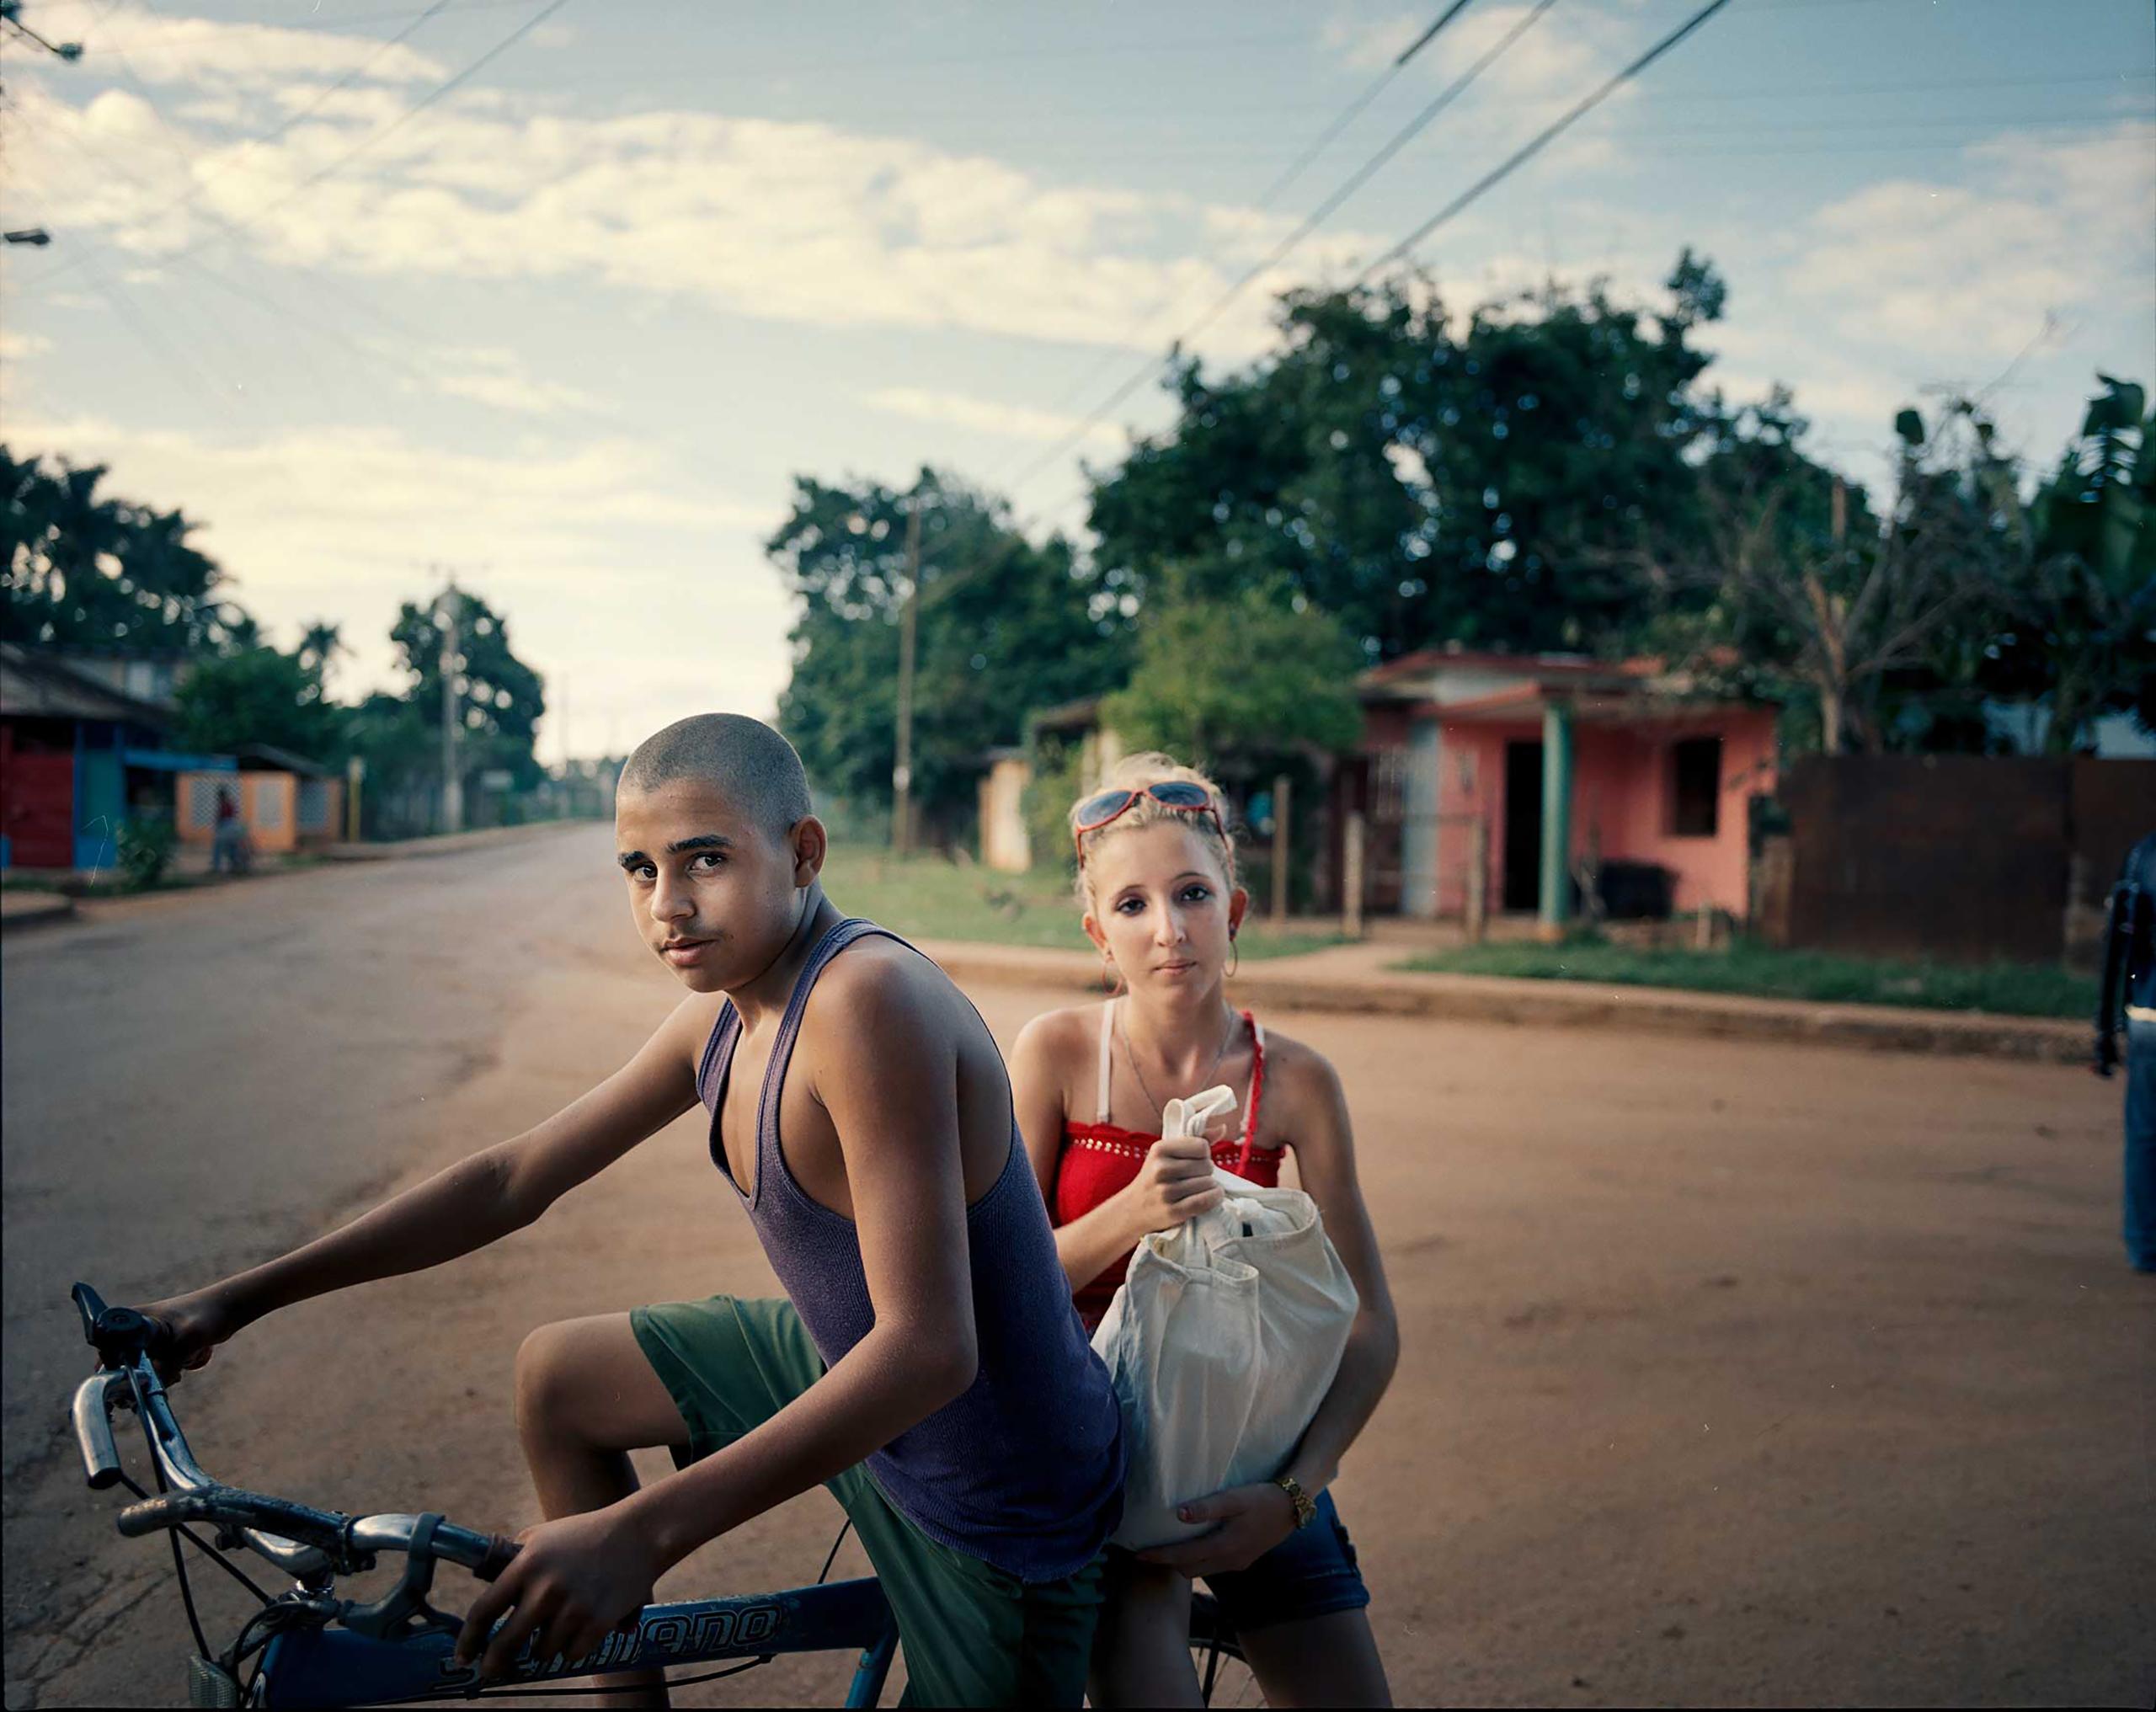 A young  couple run errands on a bike in Artemisa province, south of Havana, Cuba.